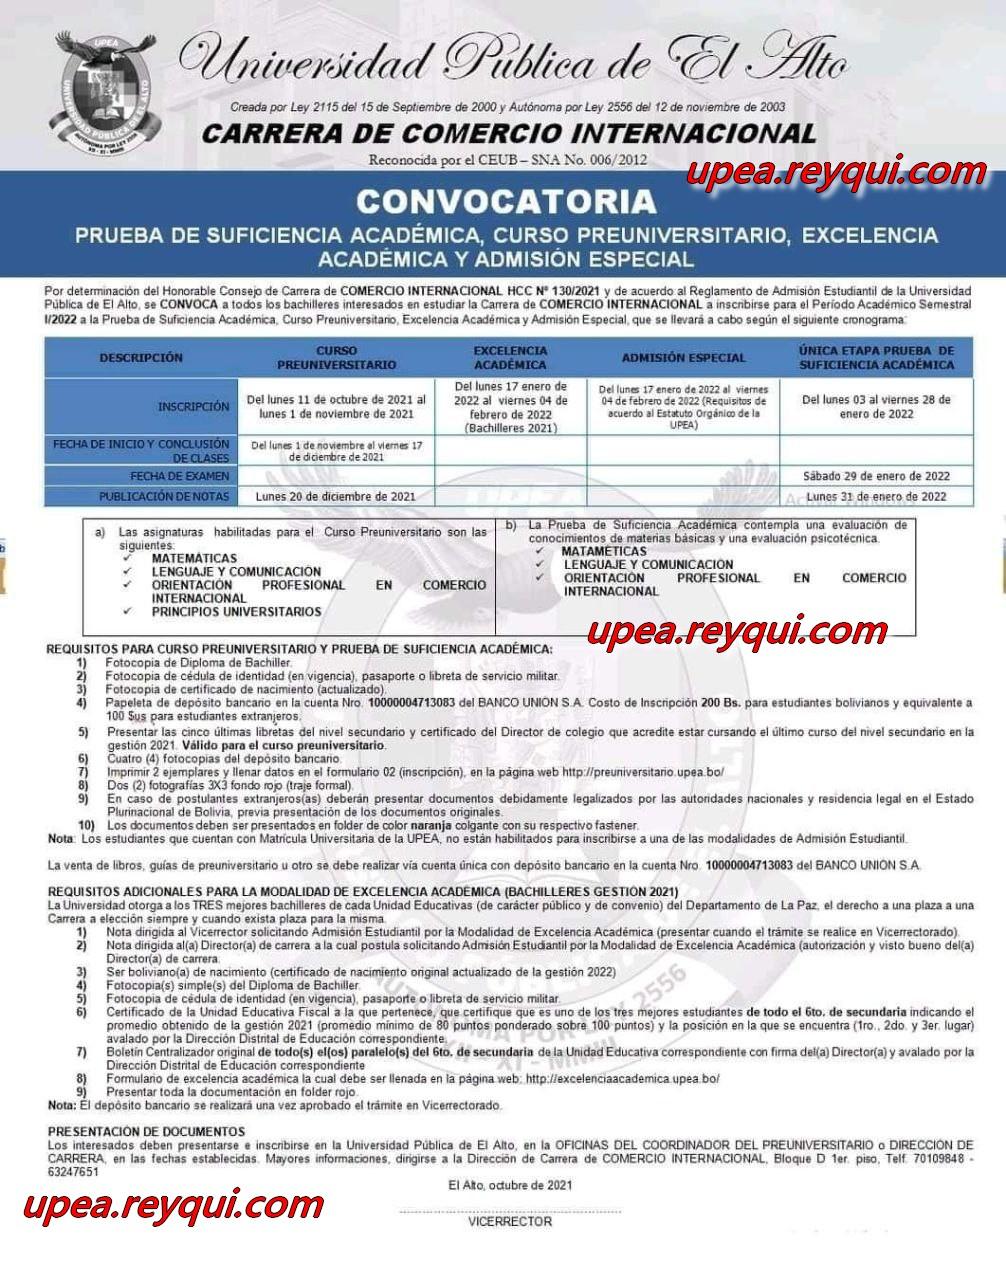 Convocatorias UPEA 2022